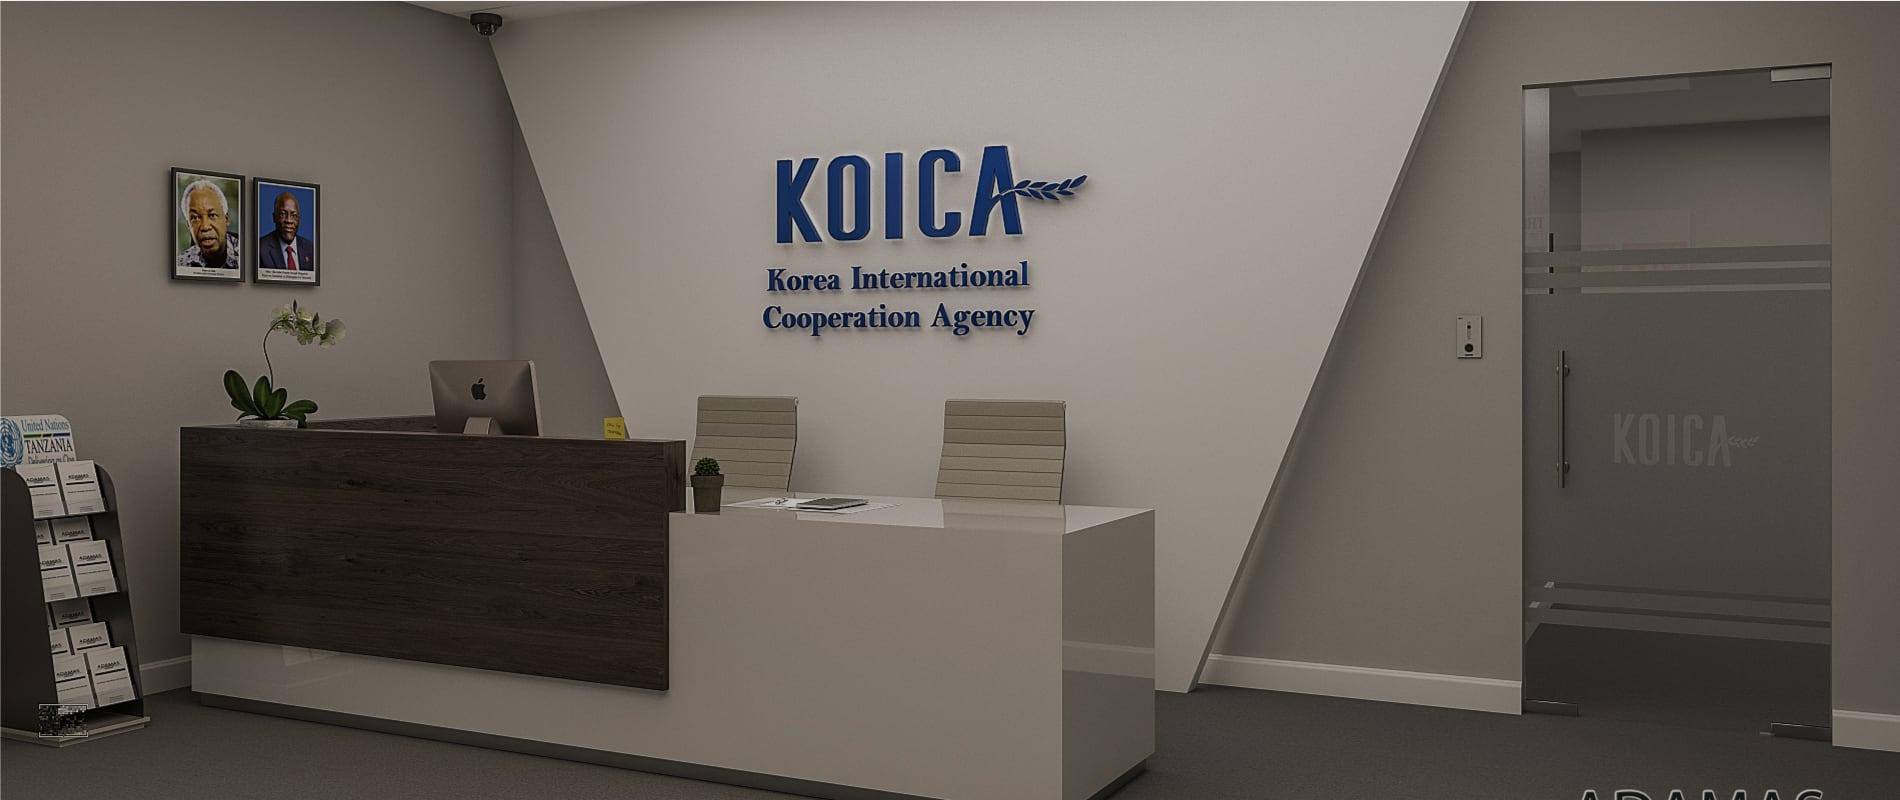 KOICA-Main-Slide